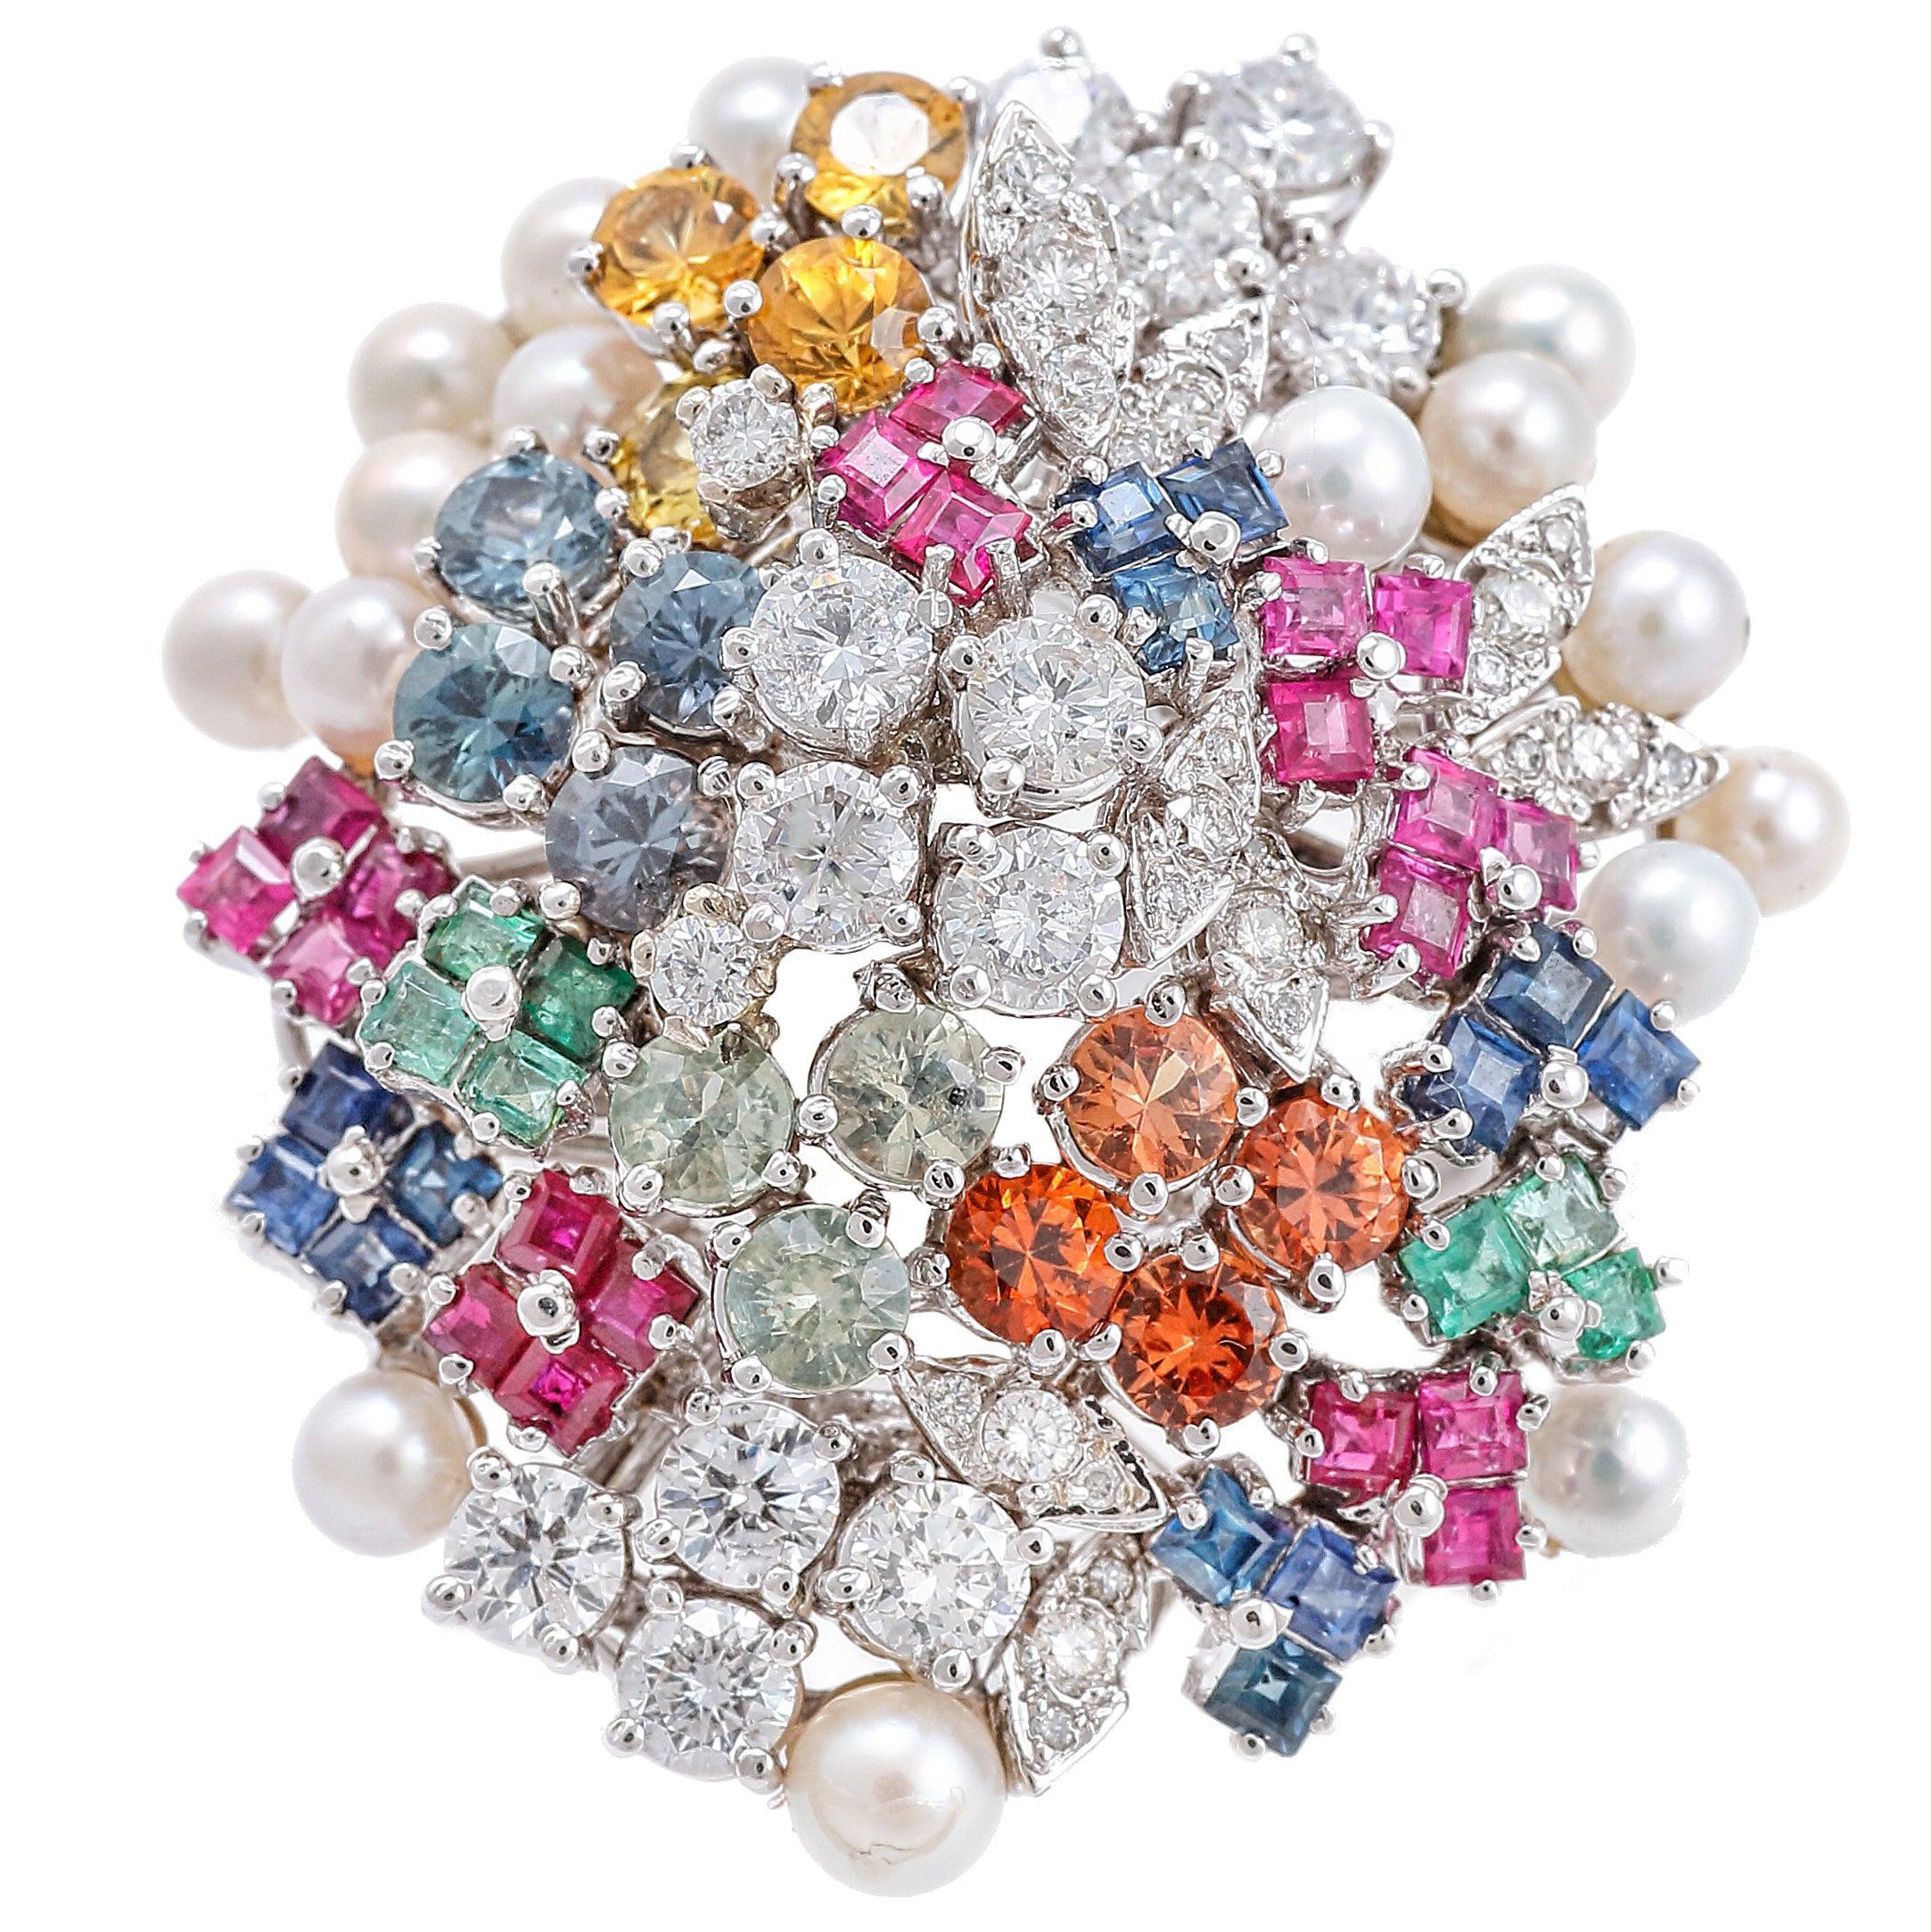 Diamonds Pearls Rubies Sapphires Emeralds White Gold Ring